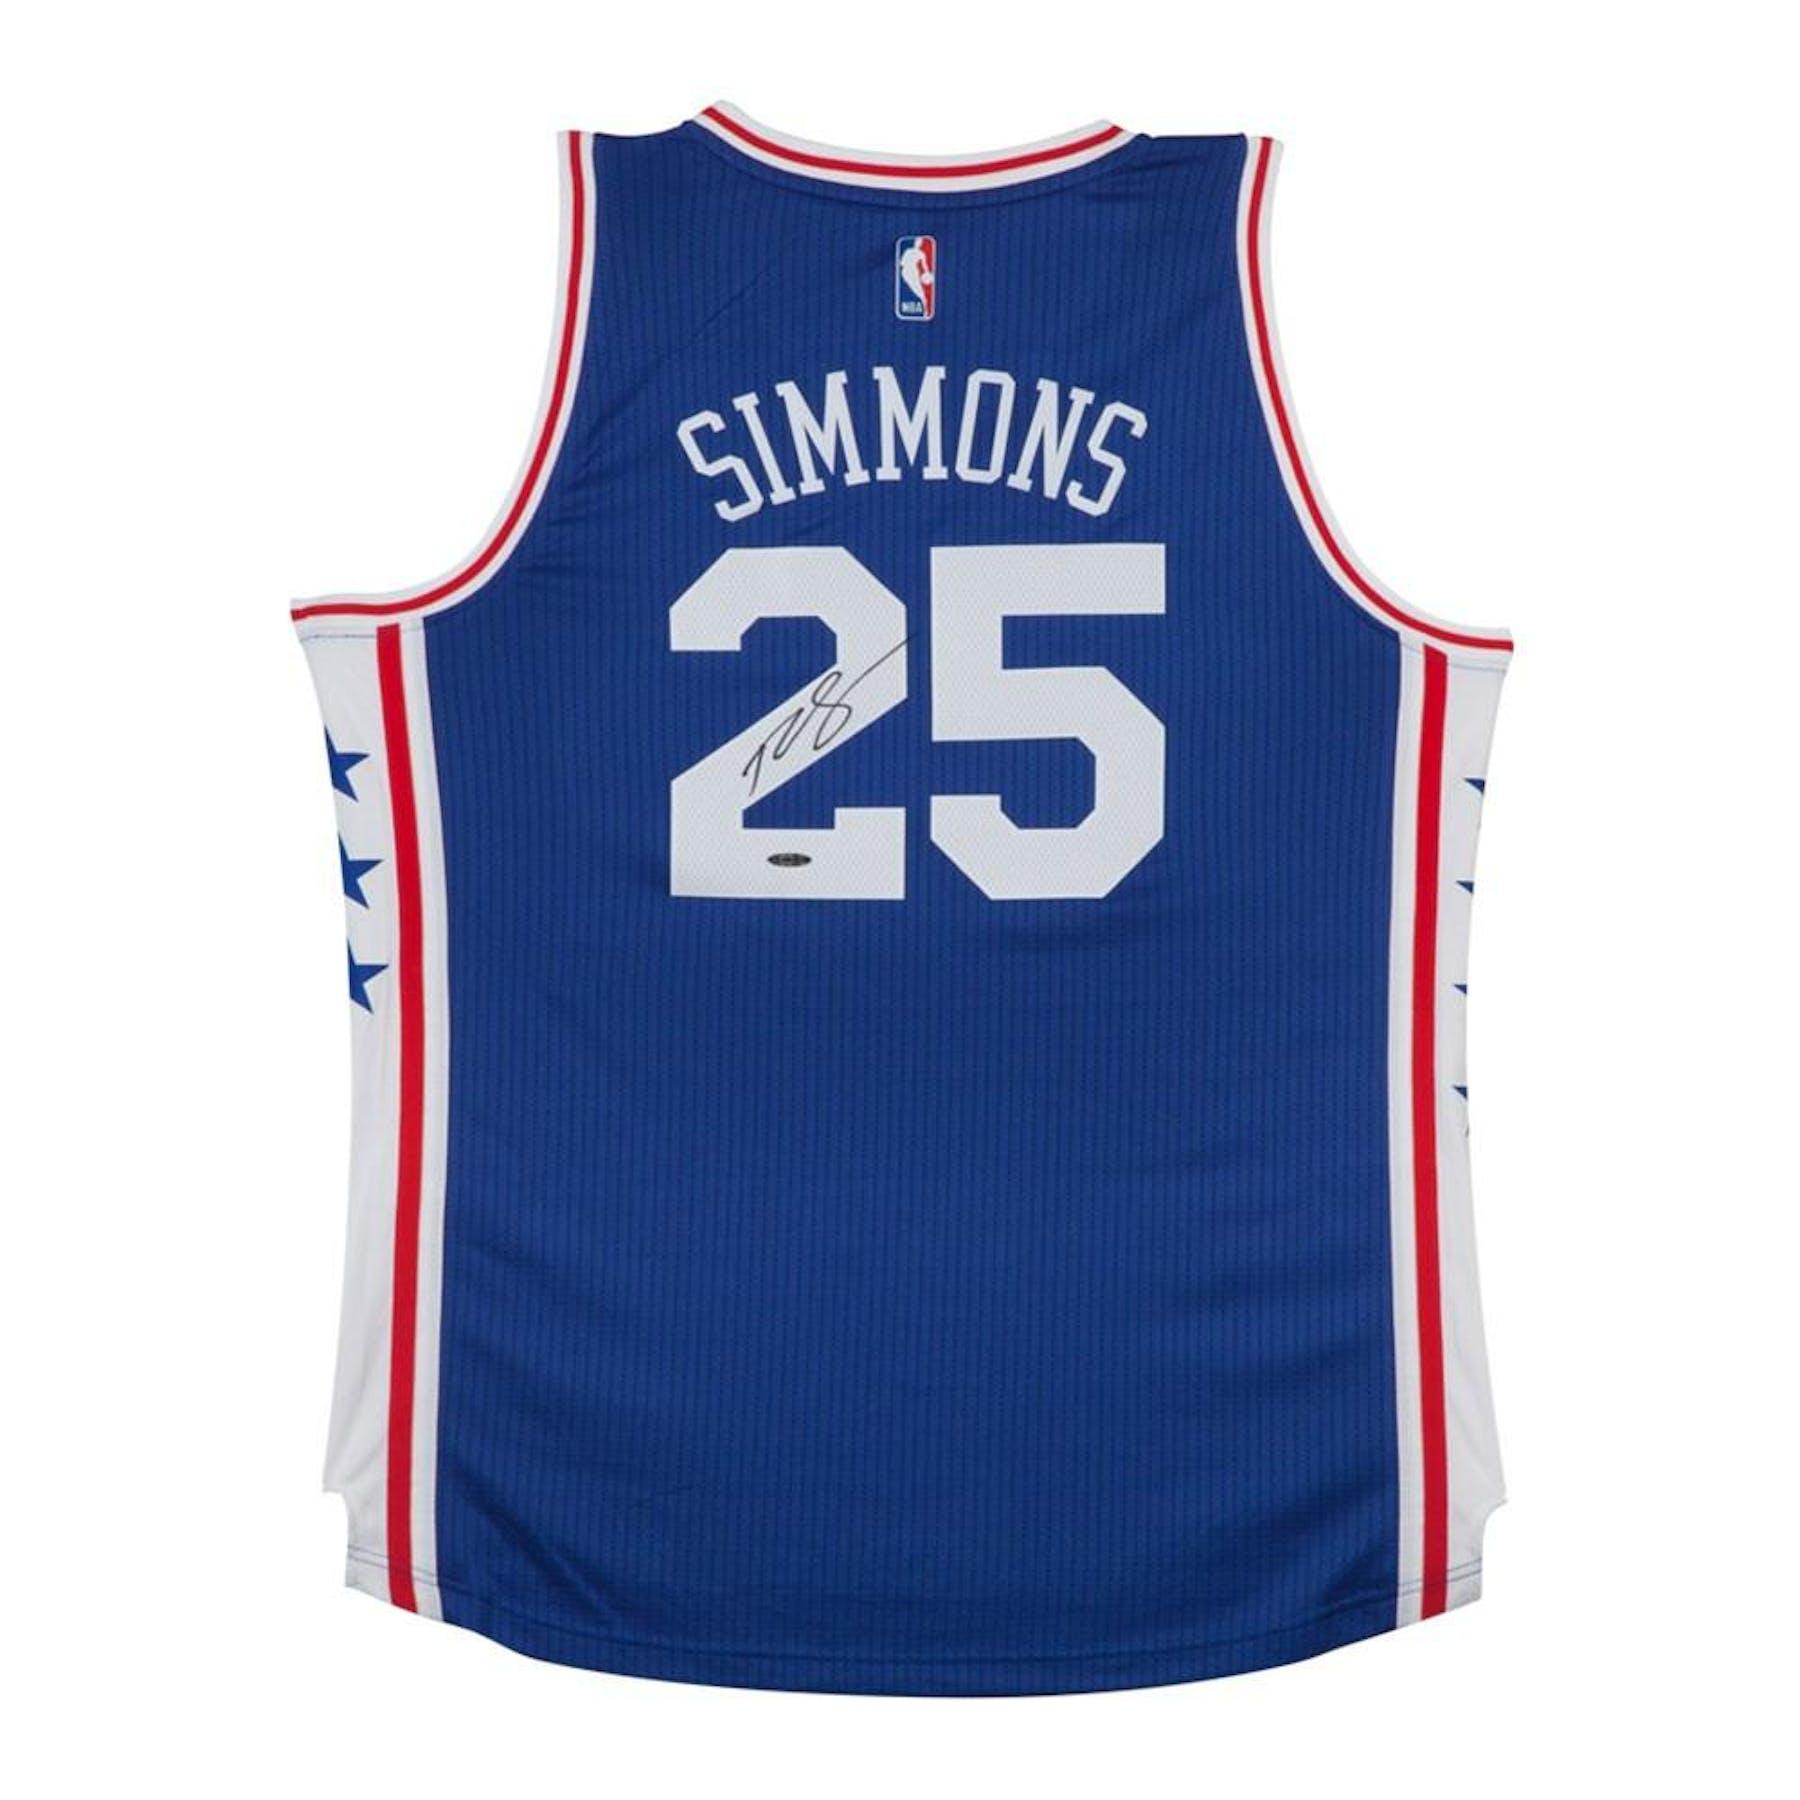 a93f7823b381 Ben Simmons Autographed Philadelphia 76ers Blue Basketball Jersey UDA